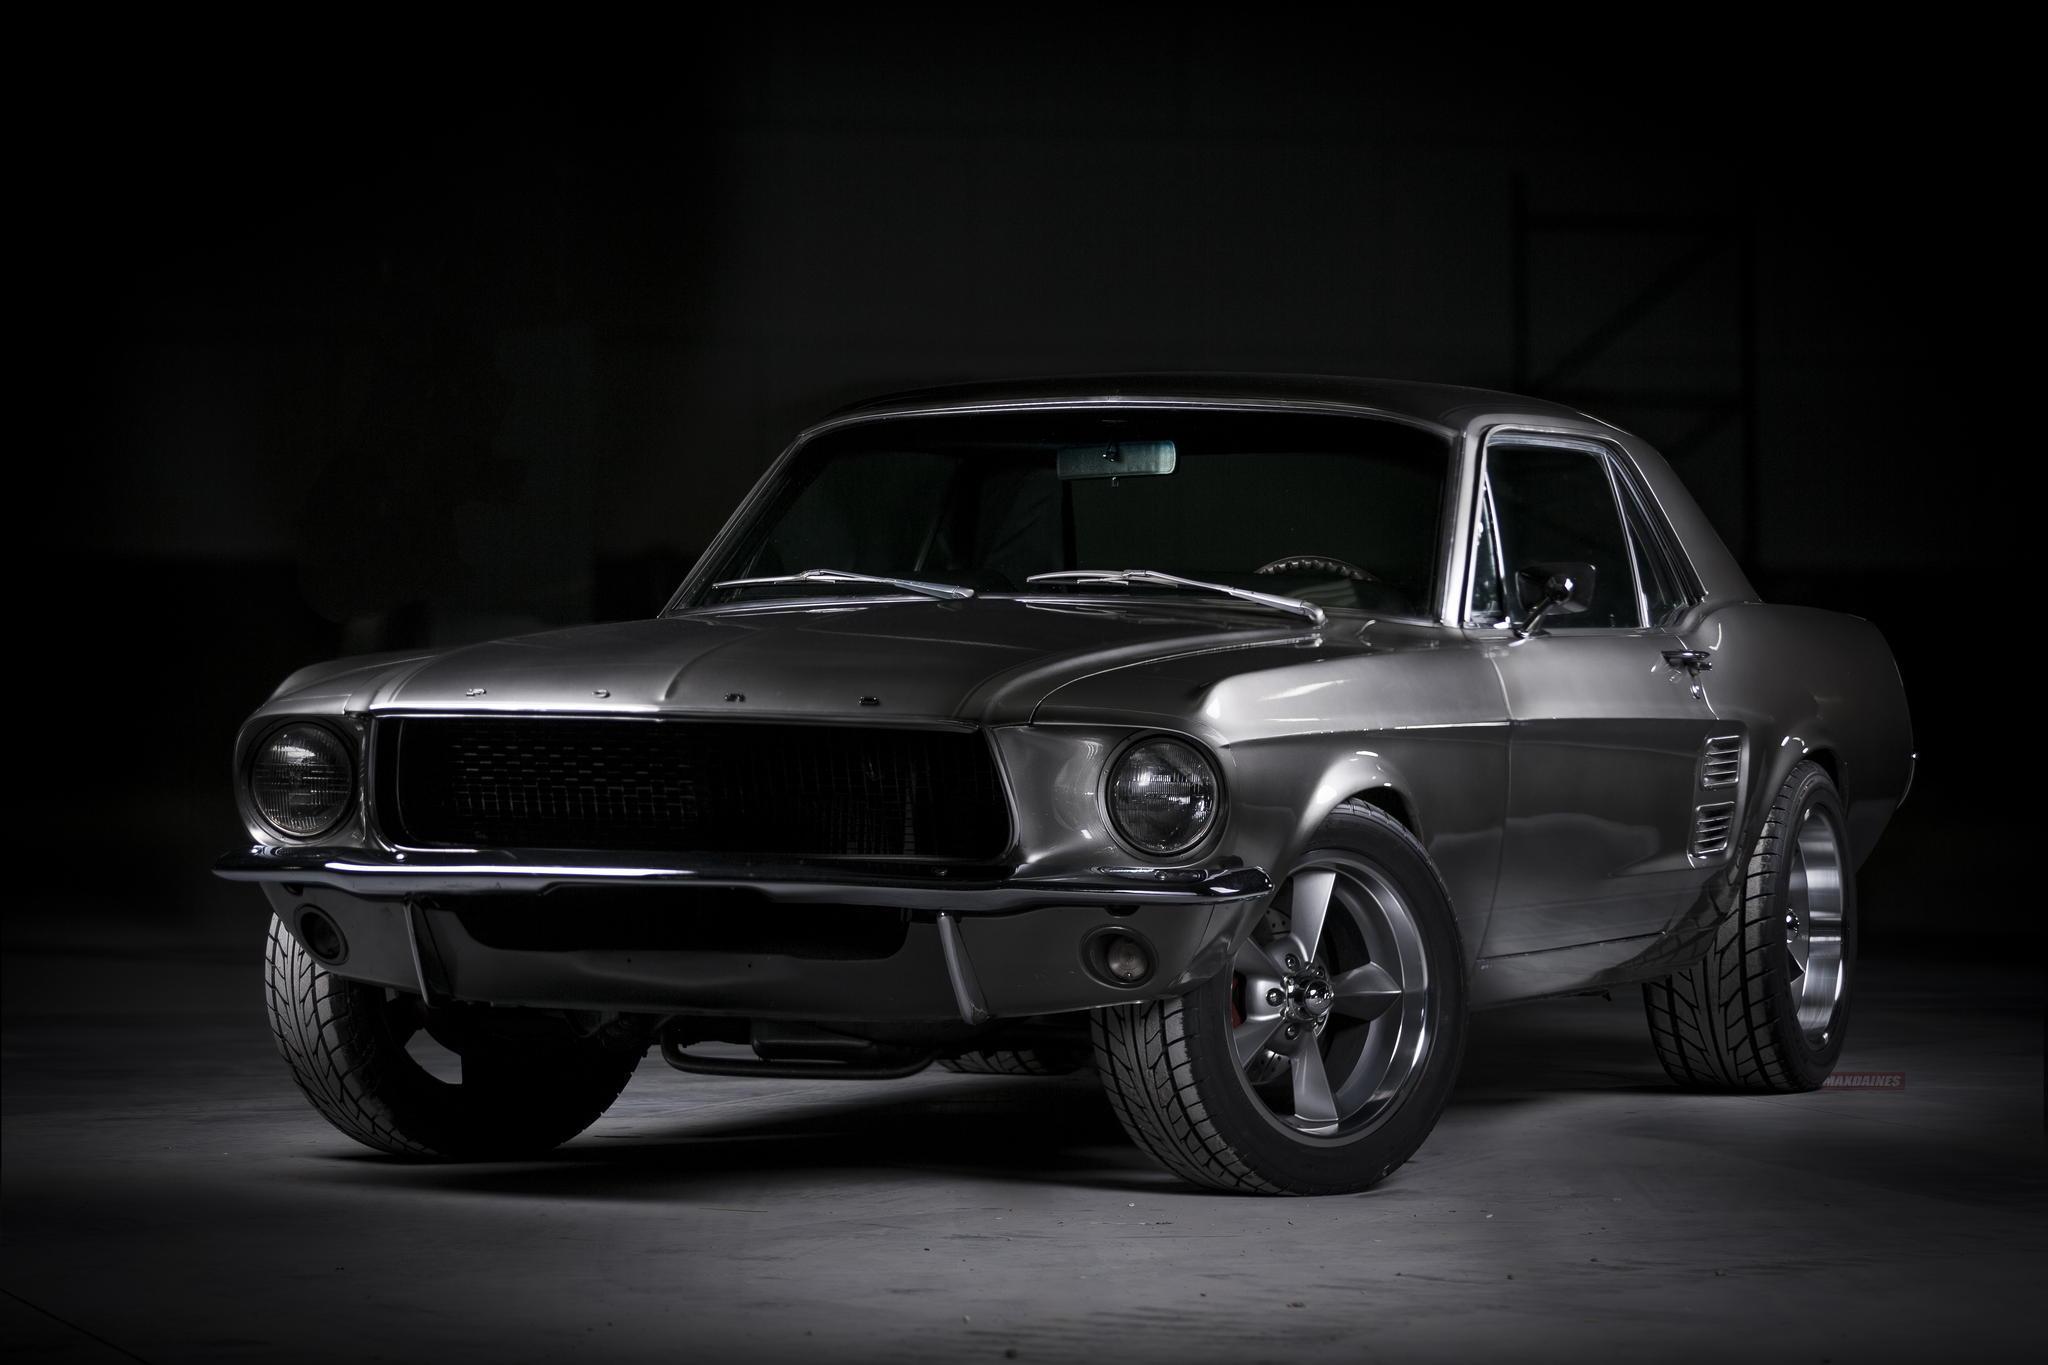 1967 Mustang Wallpapers 2048x1365